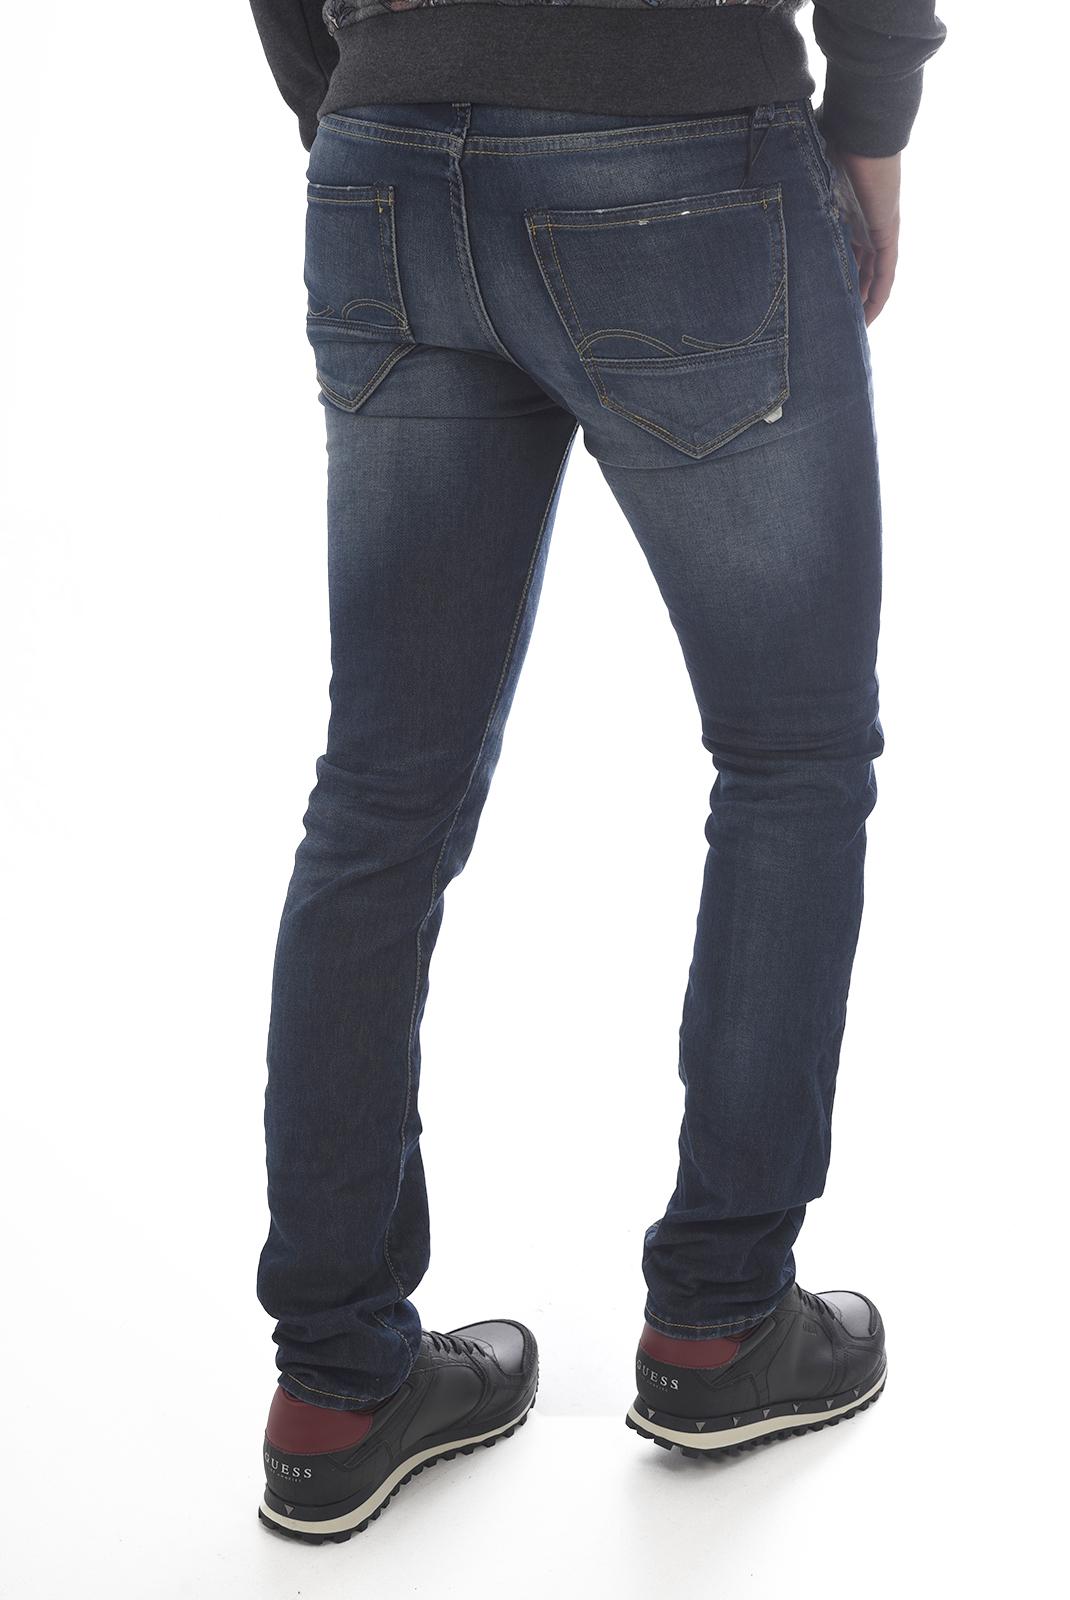 slim / skinny  Jack & Jones GLENN JJFOX BL 669 Blue Denim